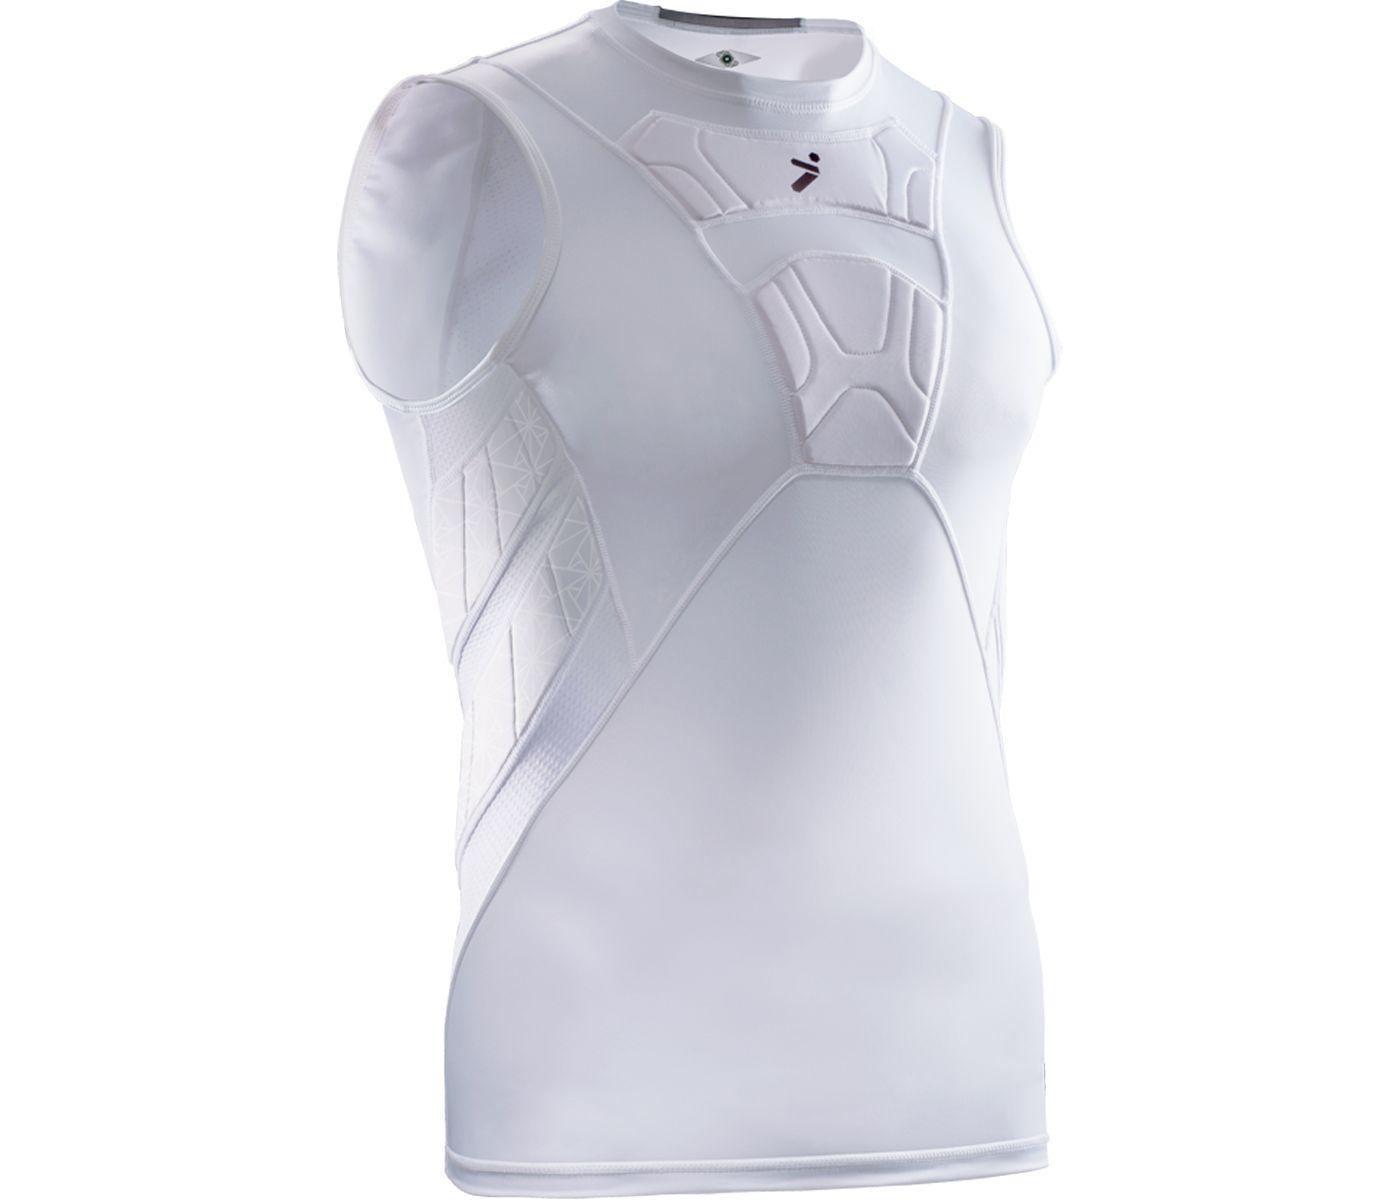 Storelli Youth BodyShield Sleeveless Soccer Field Player Shirt